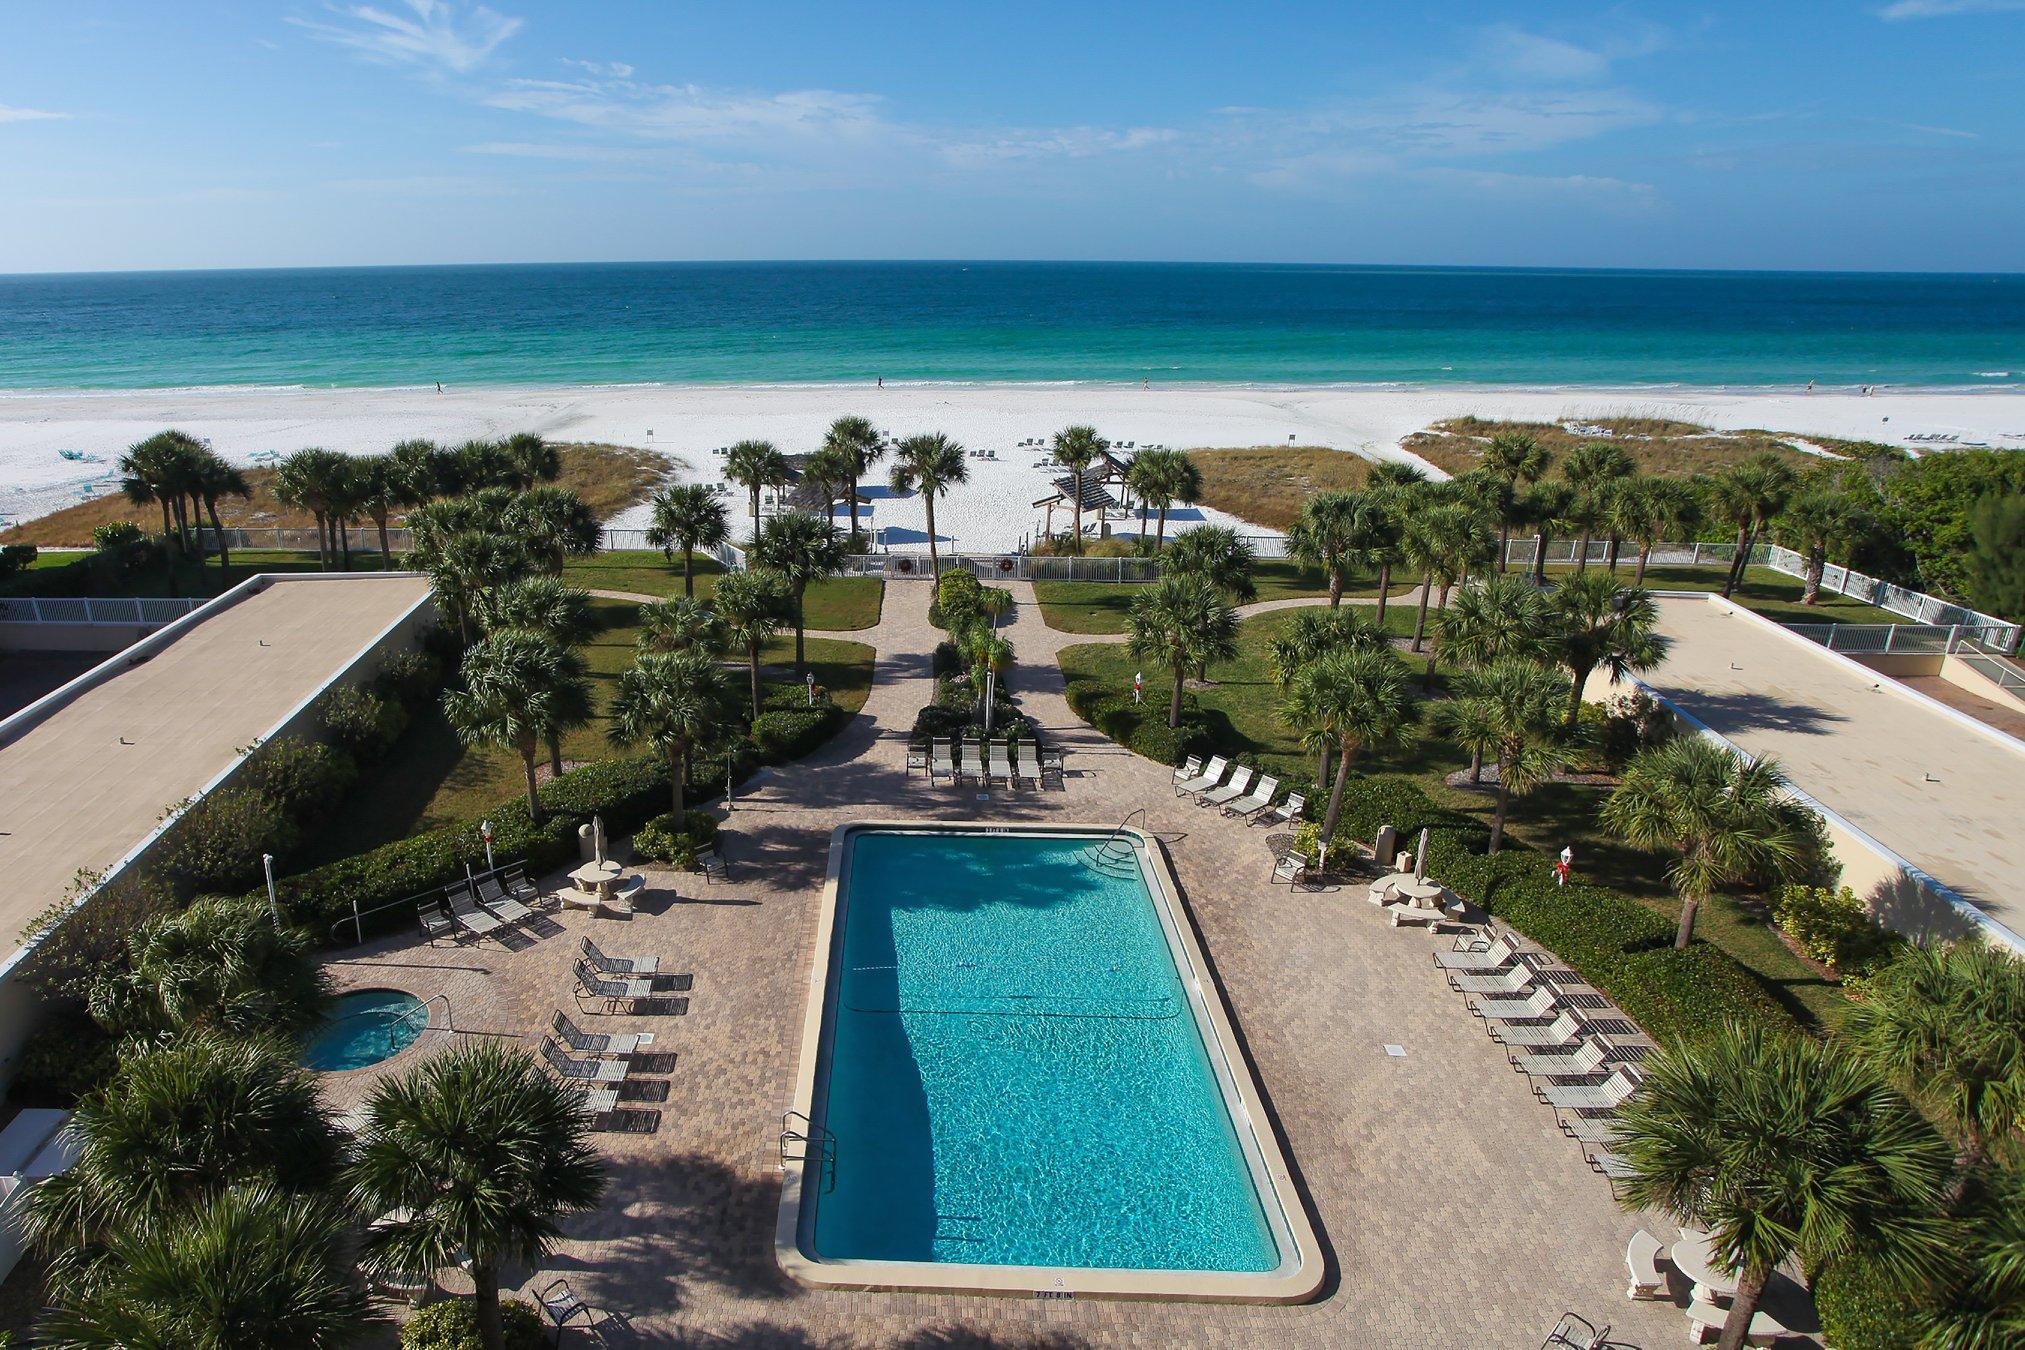 Horizons West Association Siesta Key Crescent Beach Sarasota Area Florida